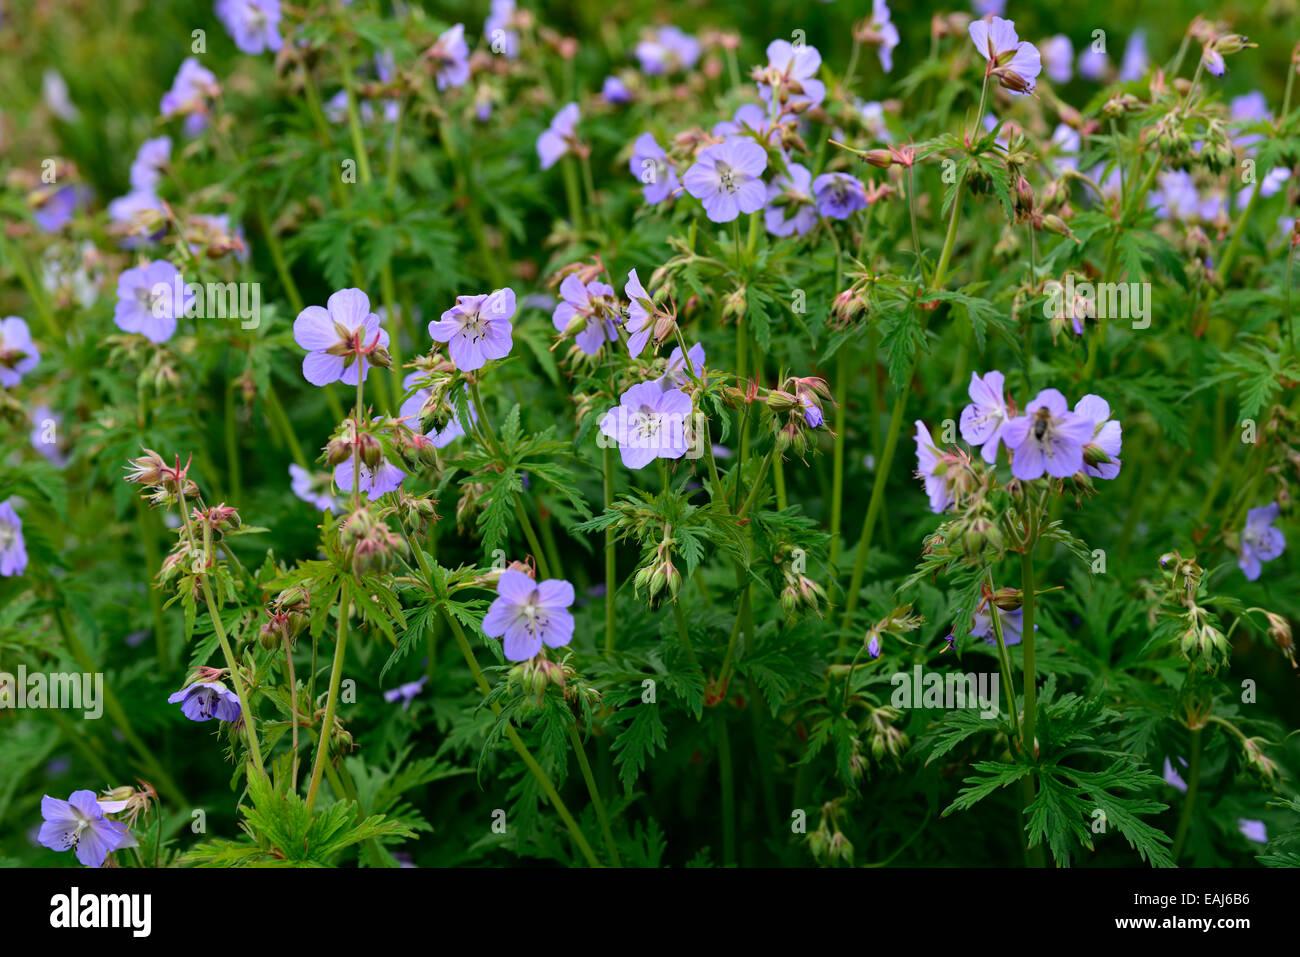 Geranium pratense mrs kendall clark blue flower flowers flowering geranium pratense mrs kendall clark blue flower flowers flowering perennial perennials rm floral mightylinksfo